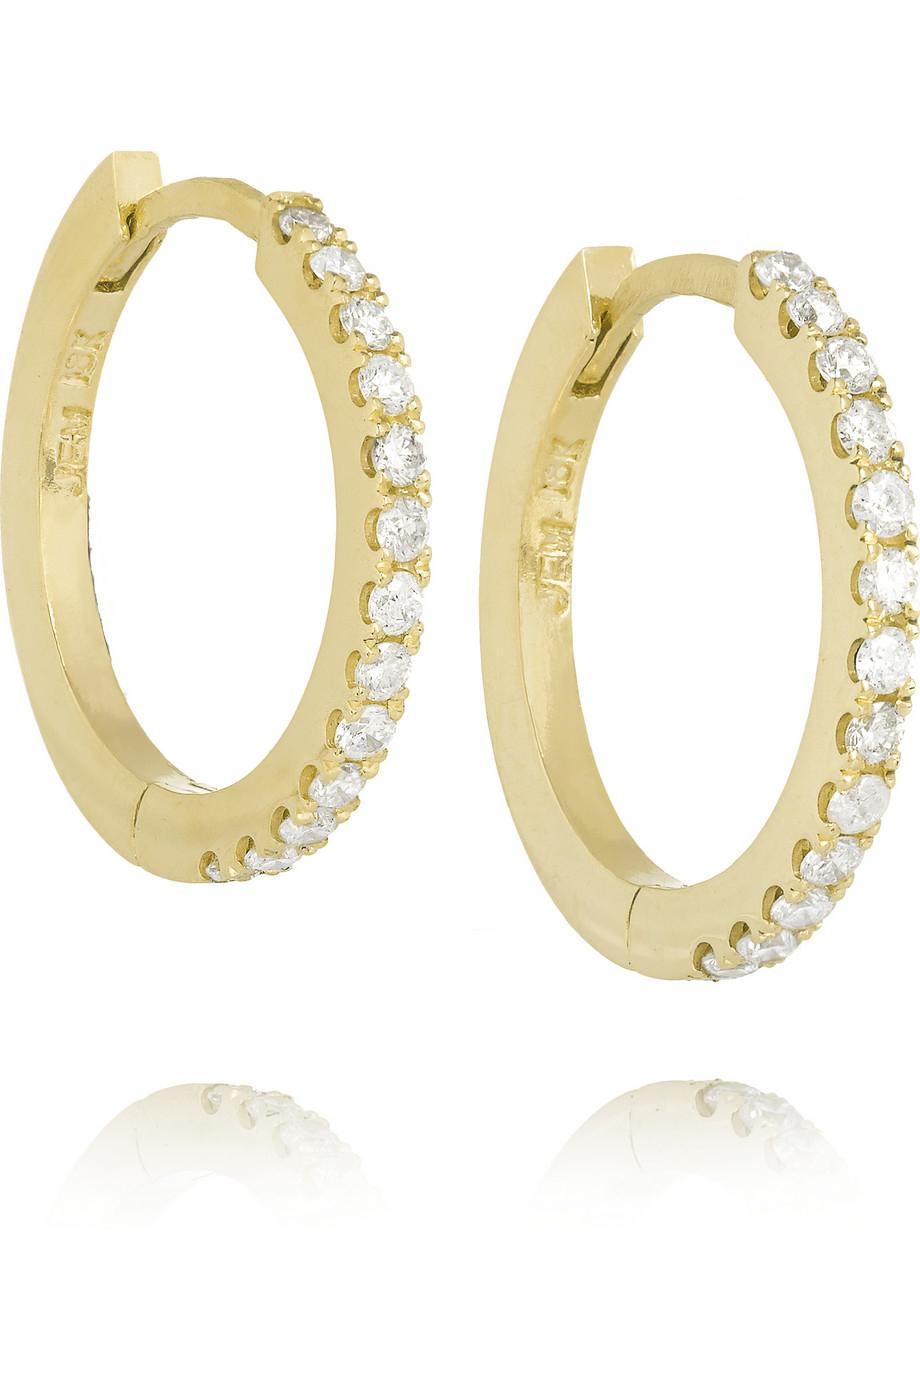 Jennifer Meyer 18-karat Gold Diamond Hoop Earrings k8i4p